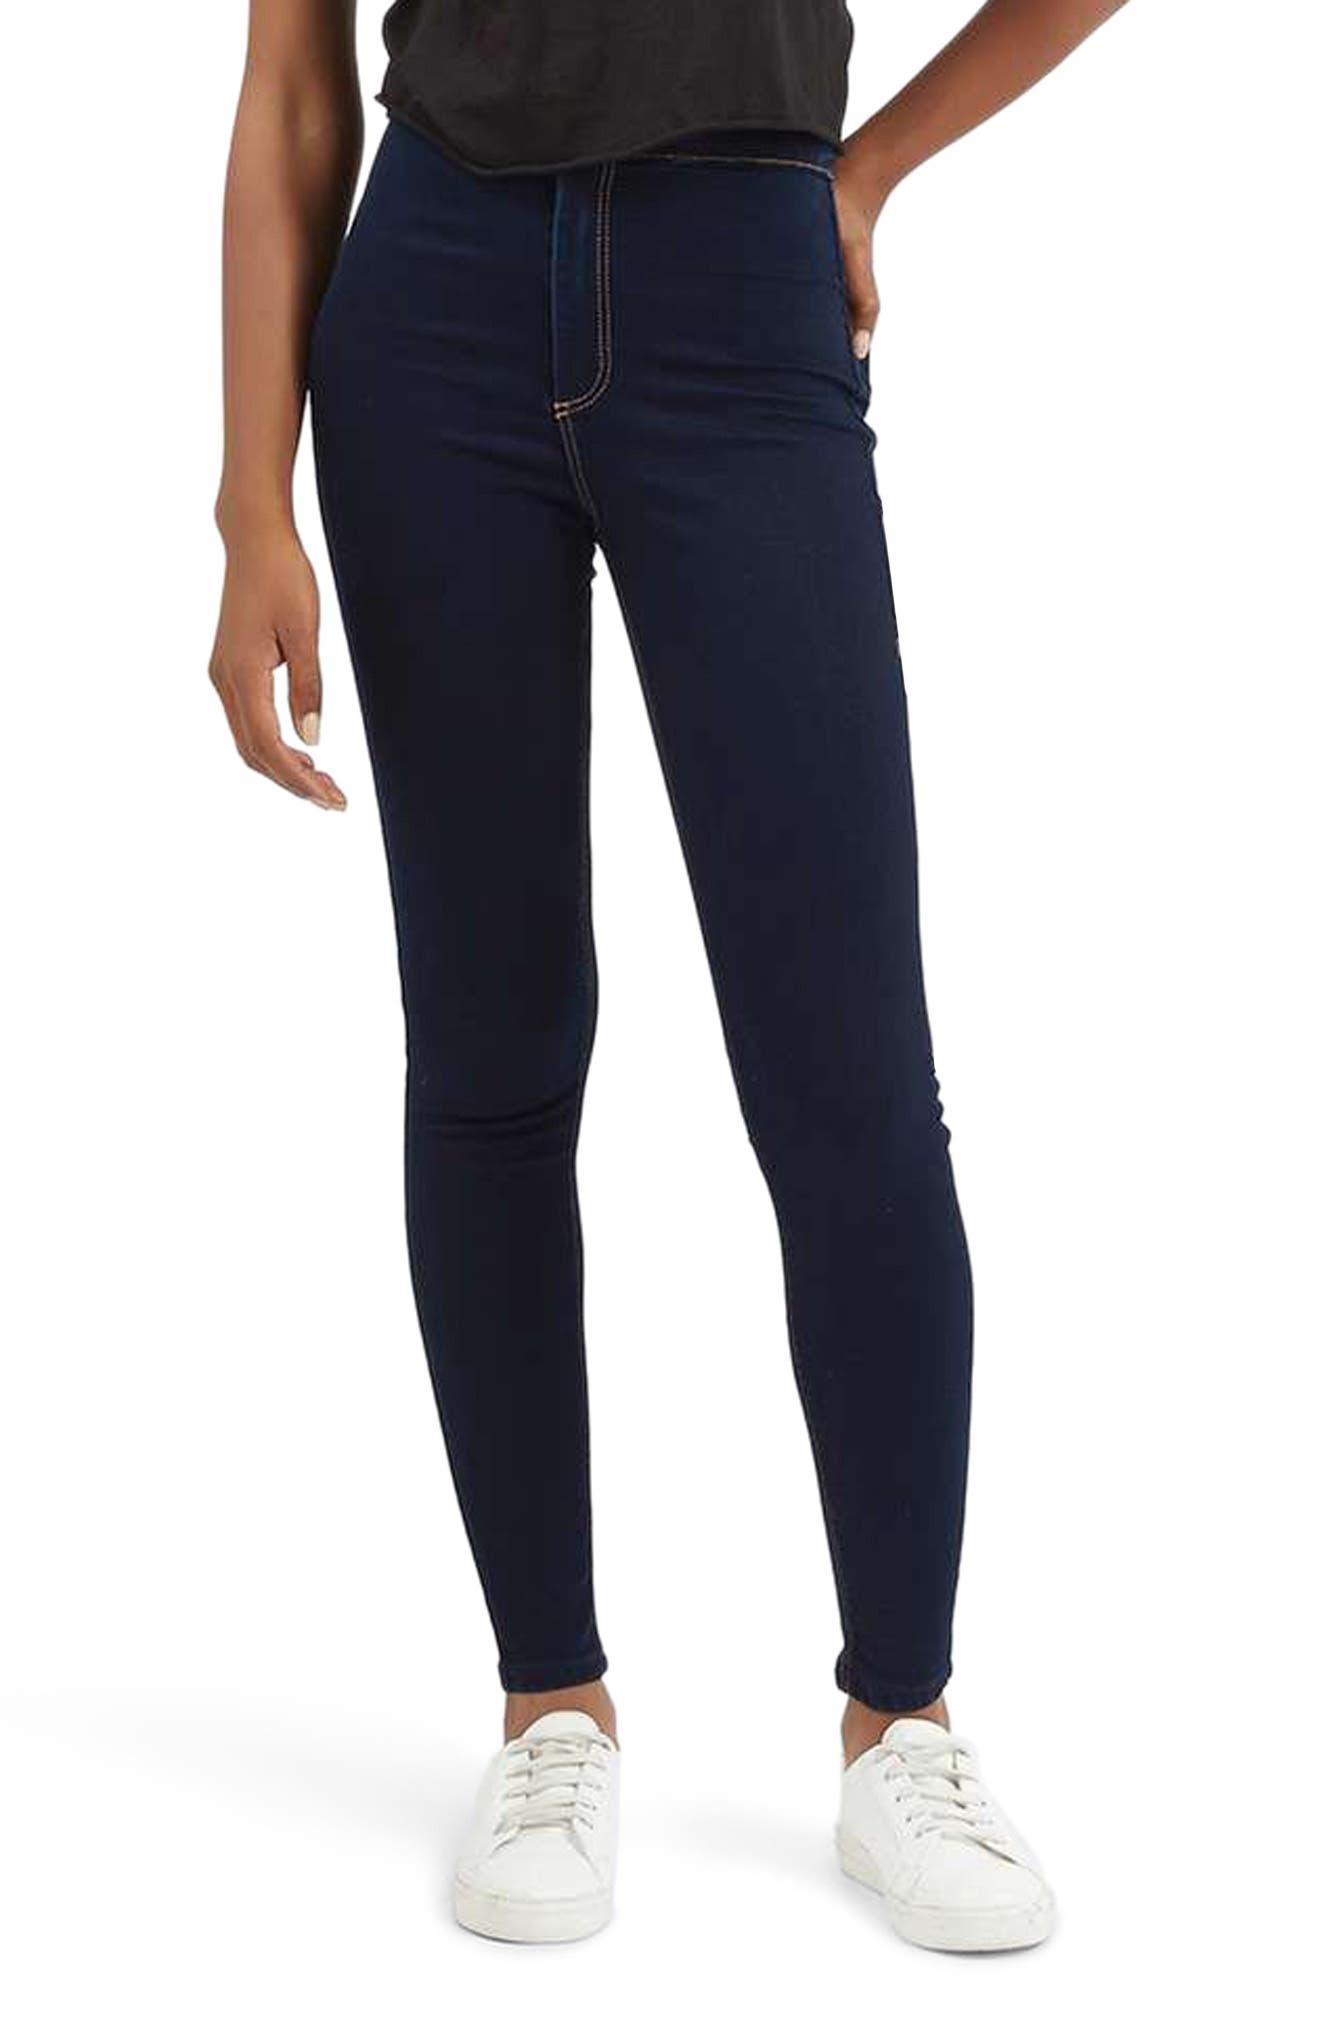 TOPSHOP Joni High Waist Skinny Jeans, Main, color, 400